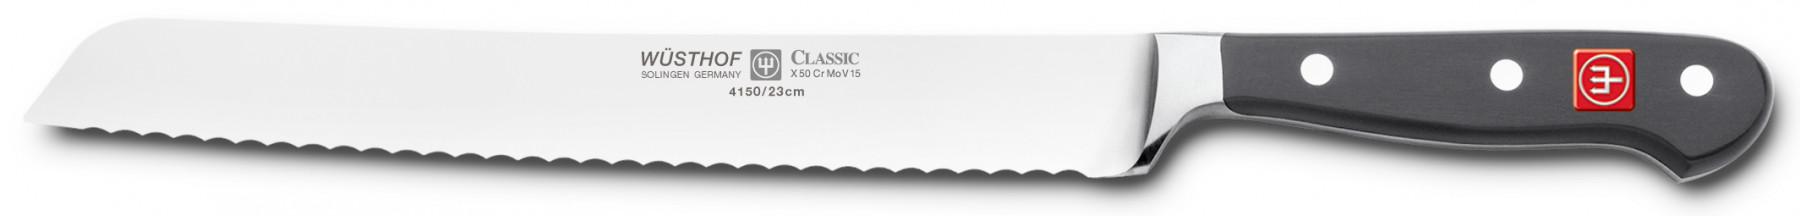 Wüsthof Dreizack Classic Brotmesser 23cm